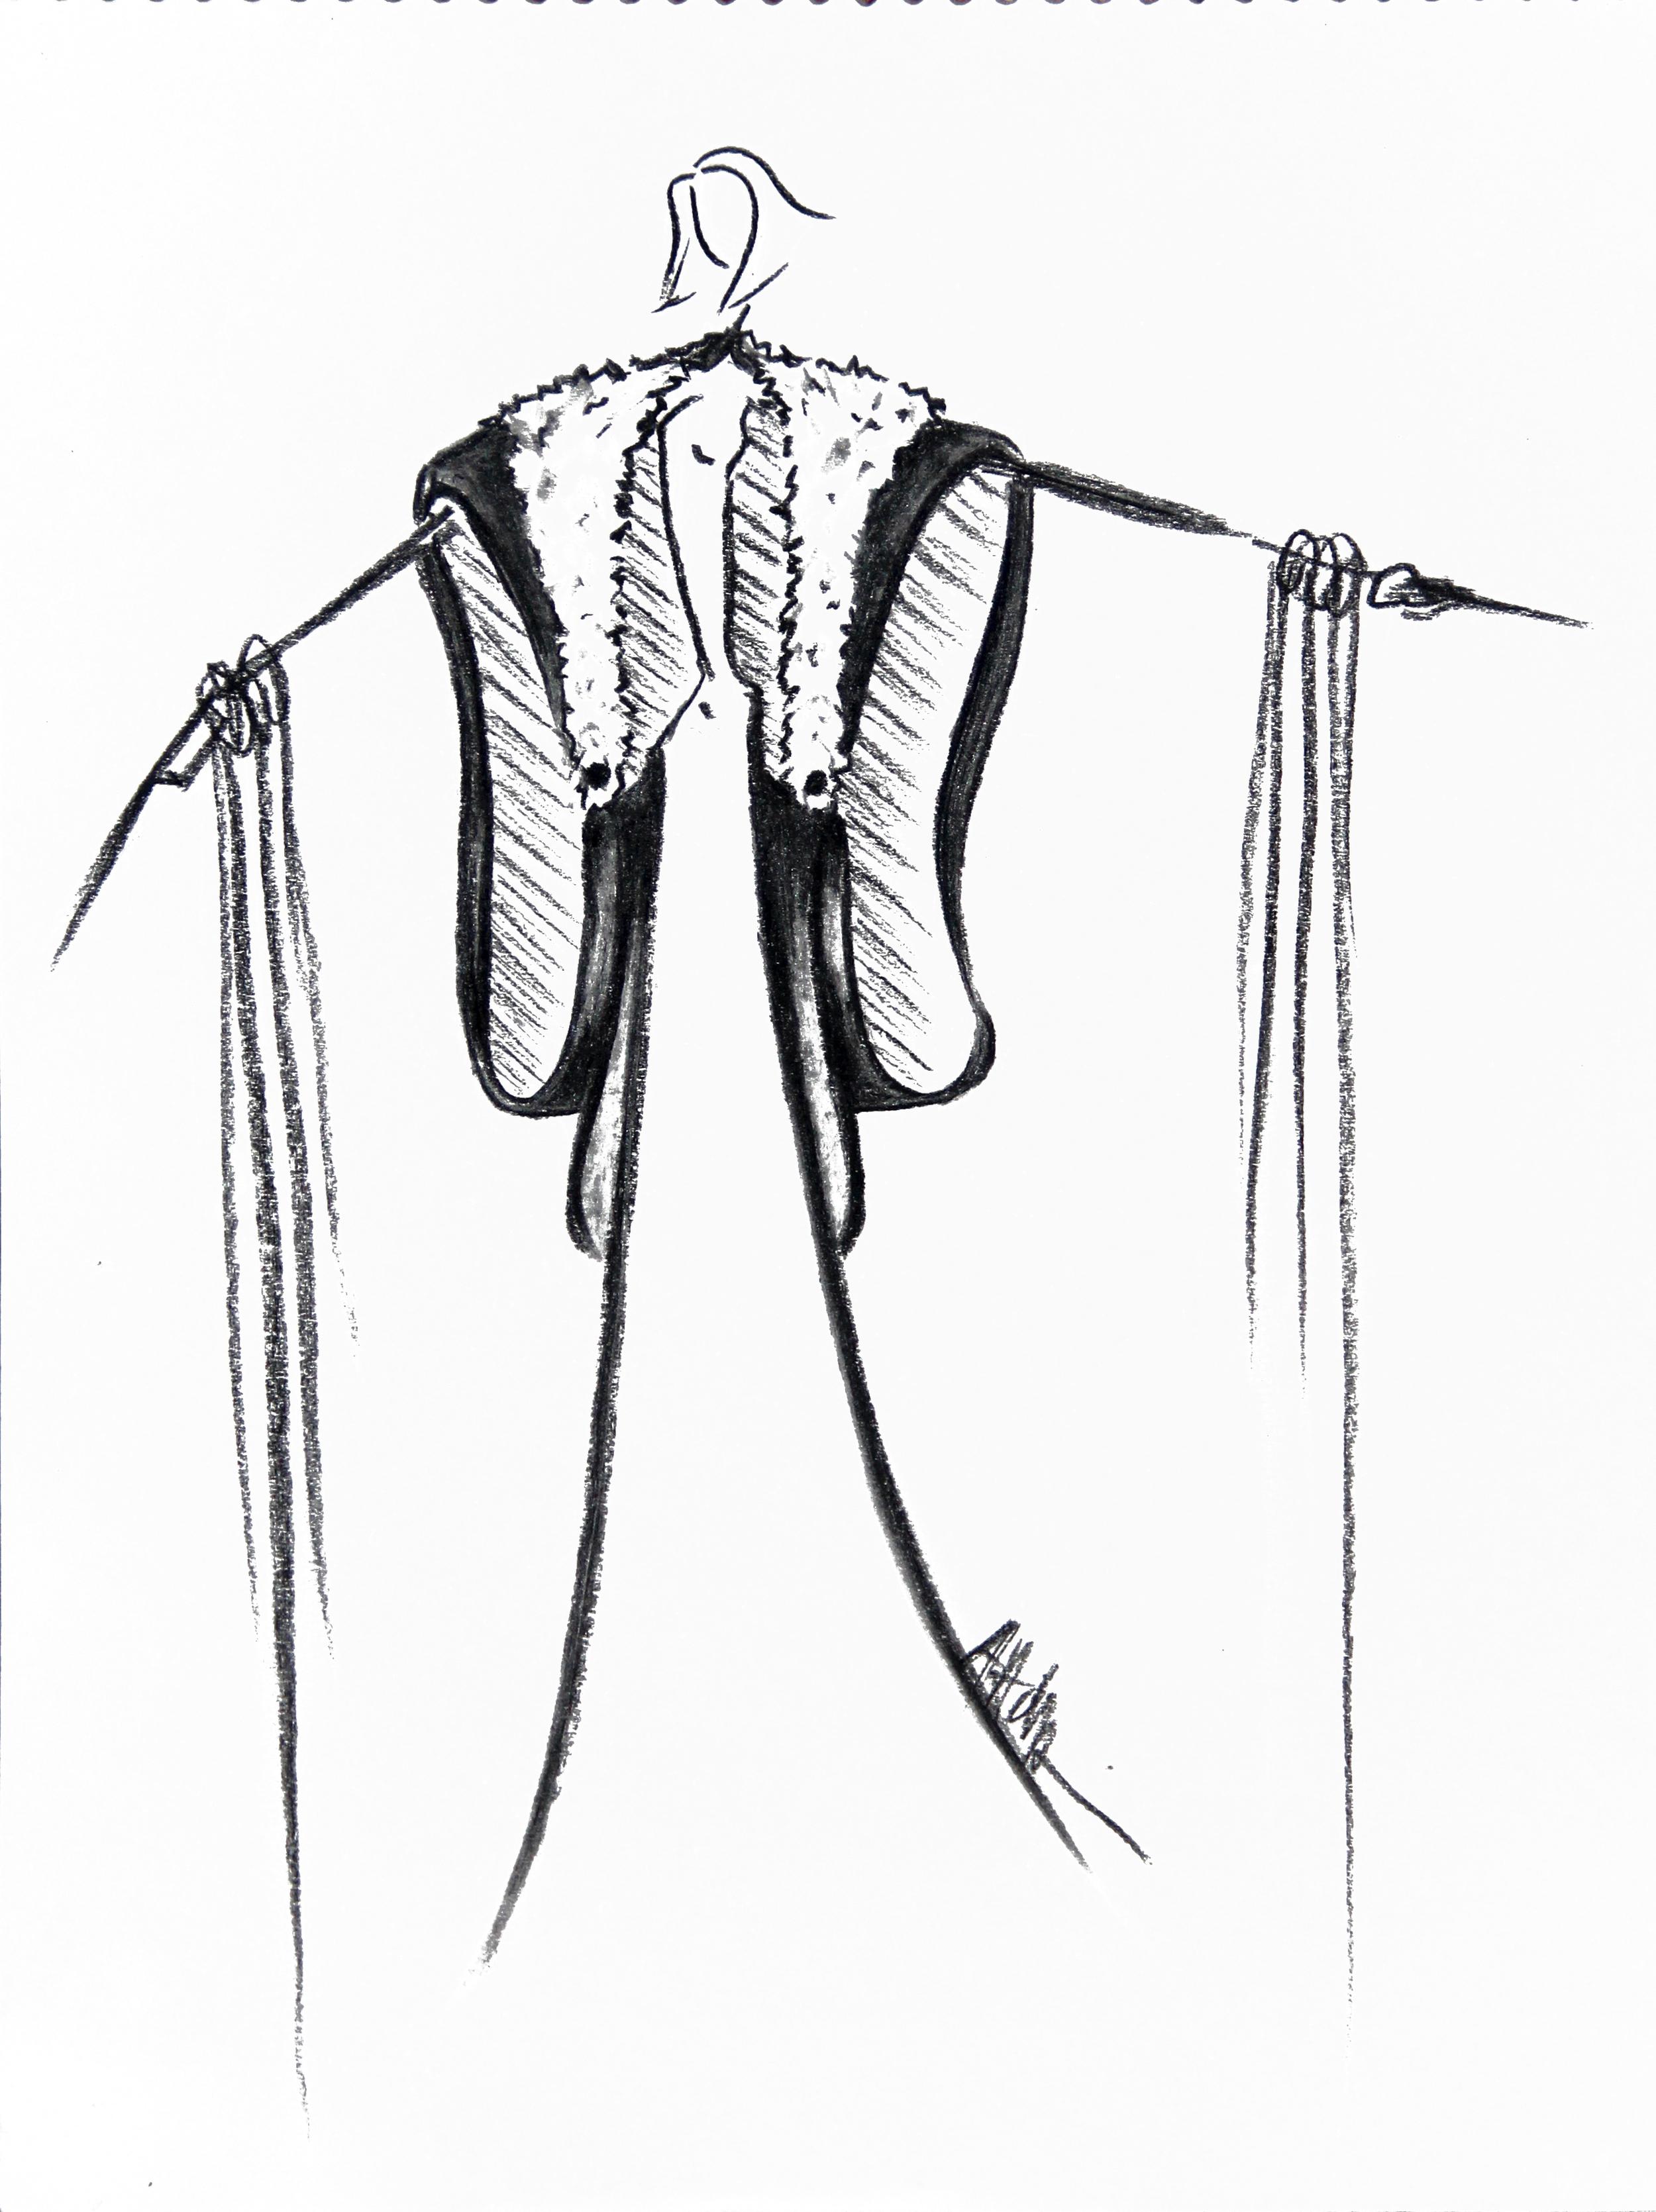 Kimono Sleeve Shrug illustration.JPG